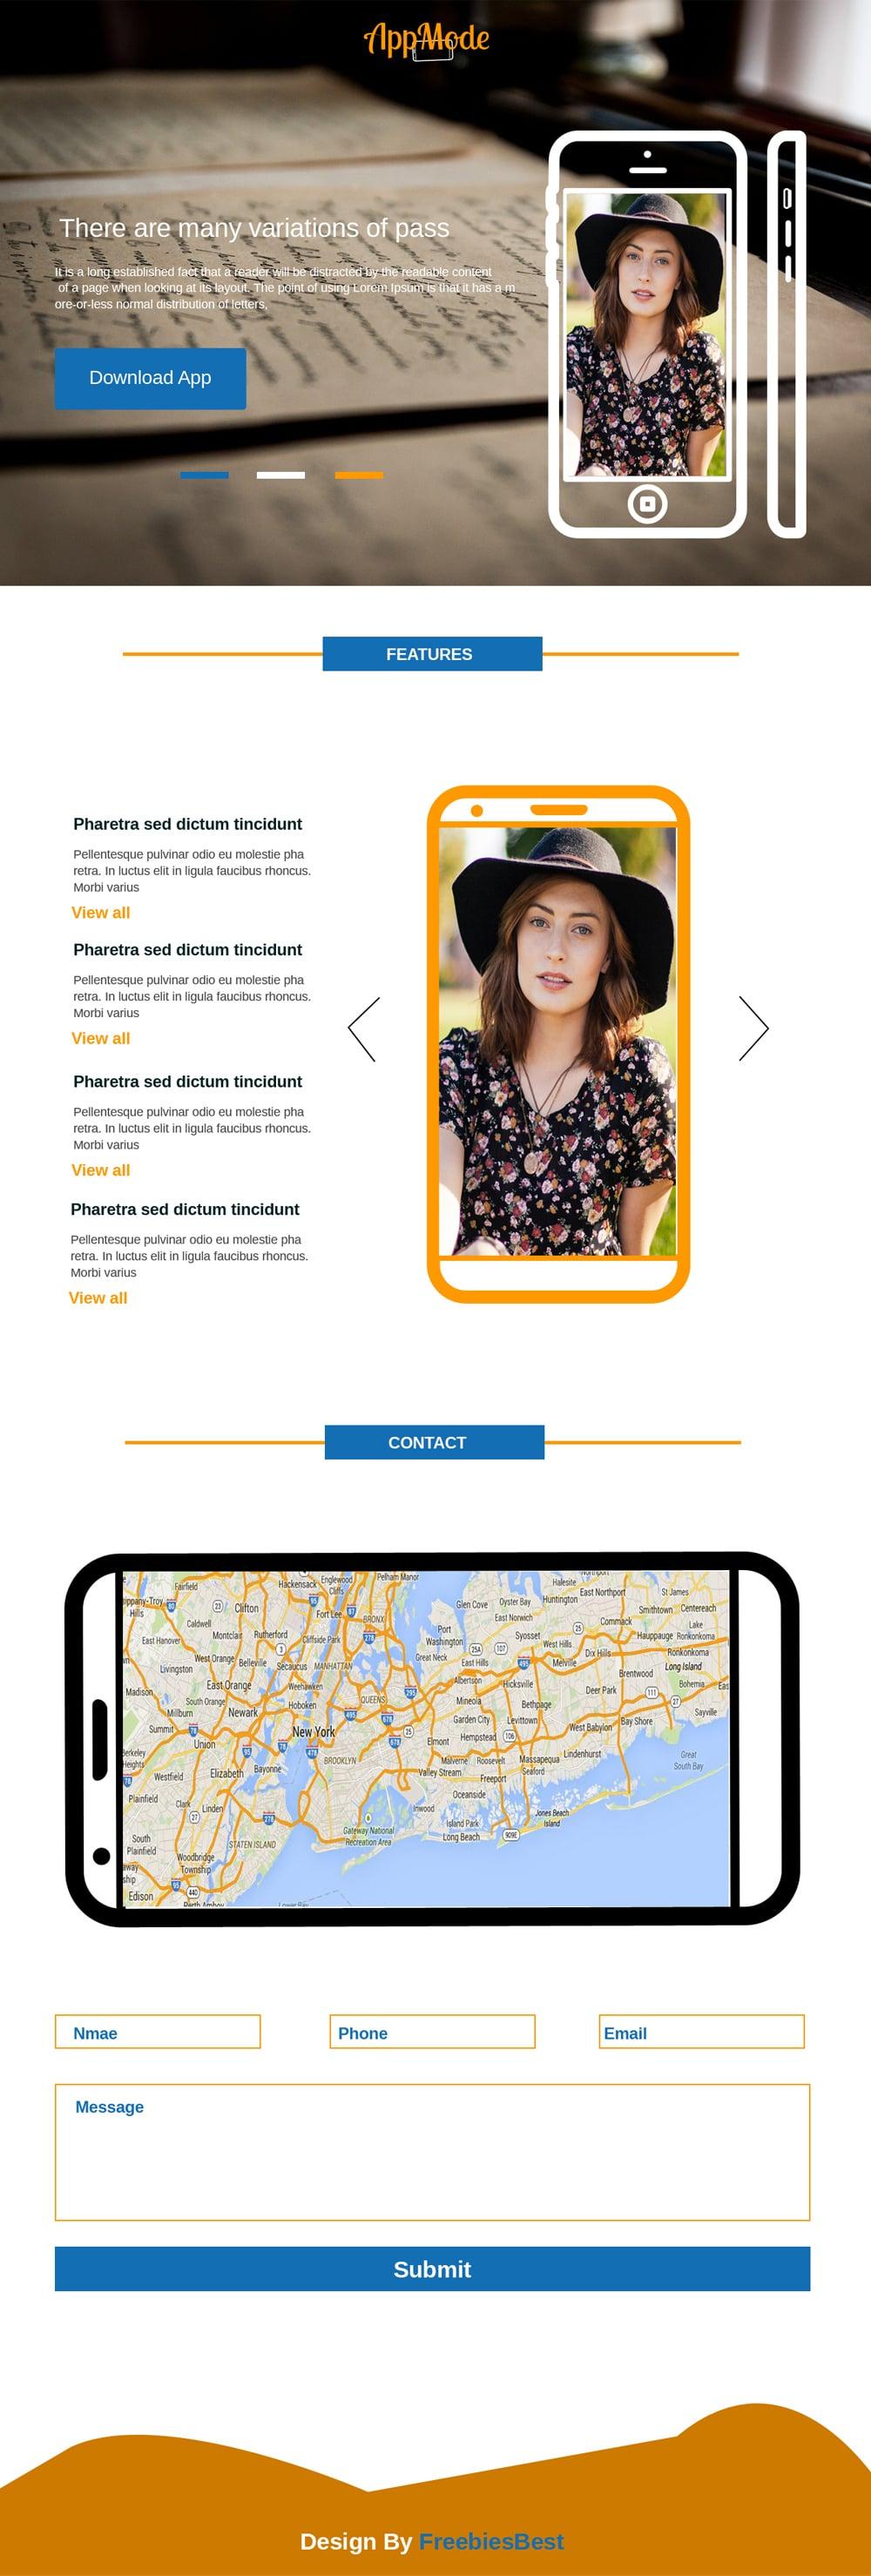 App Mode – Landing Page Multipurpose Template PSD